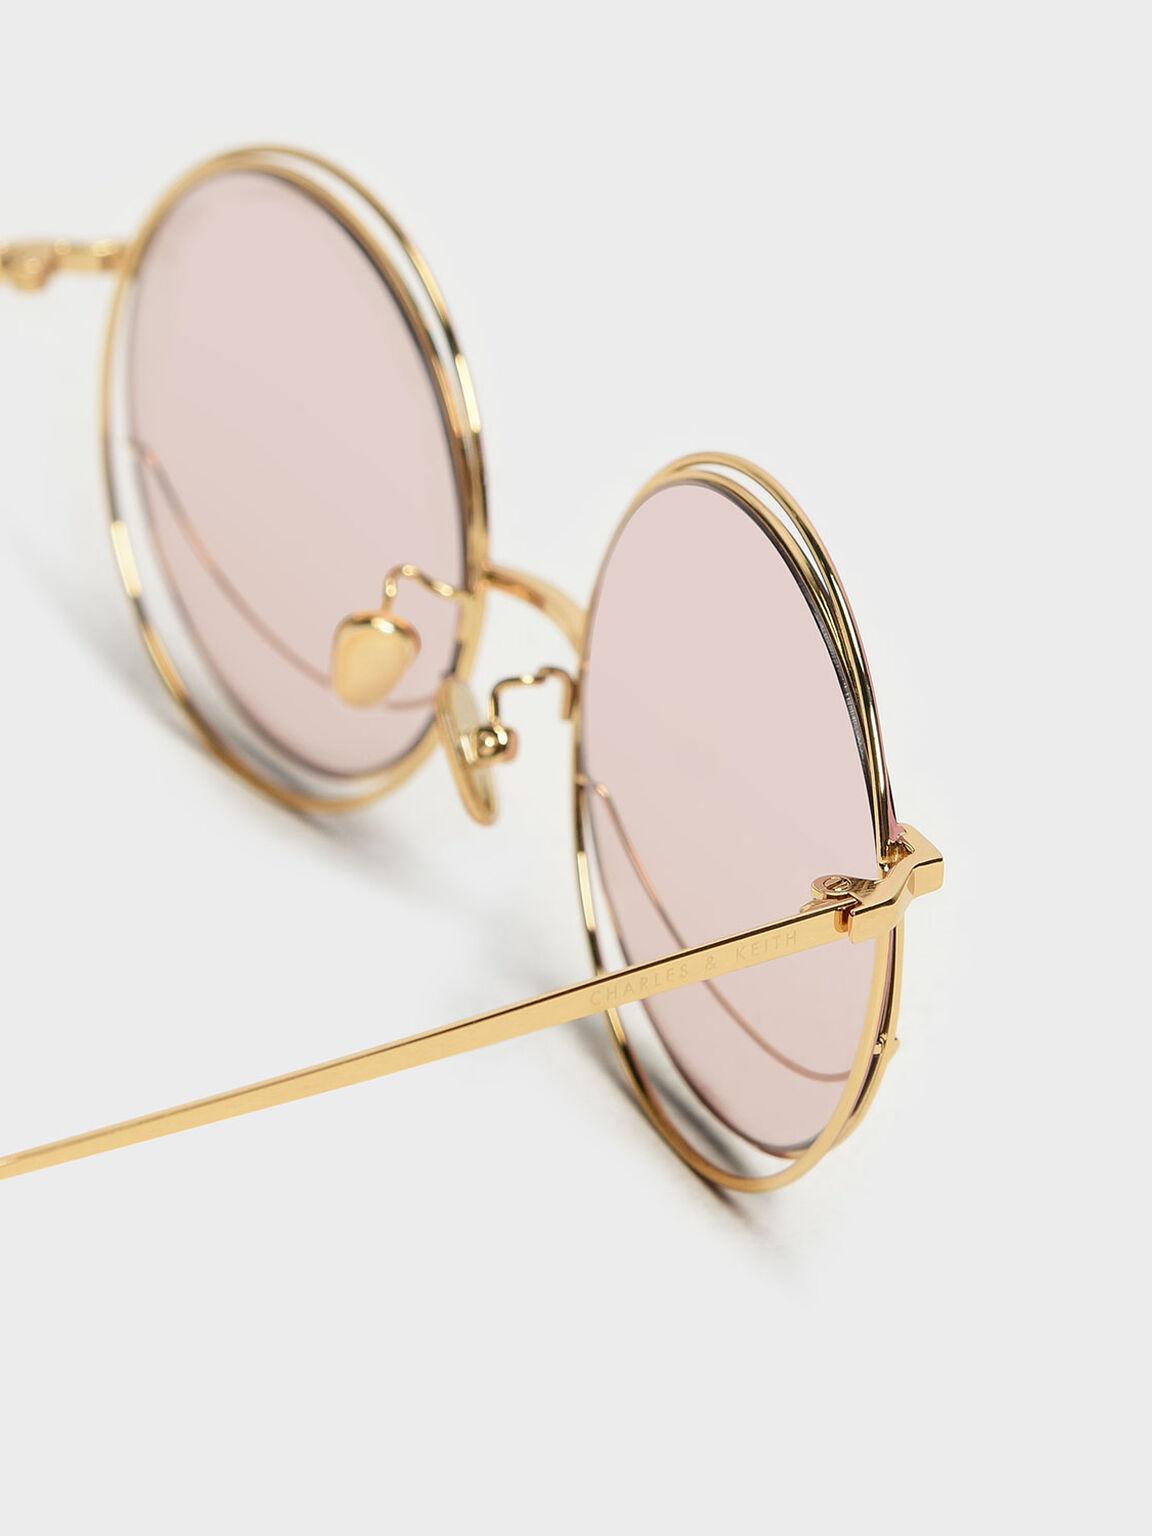 Circle Frame Sunglasses, Pink, hi-res